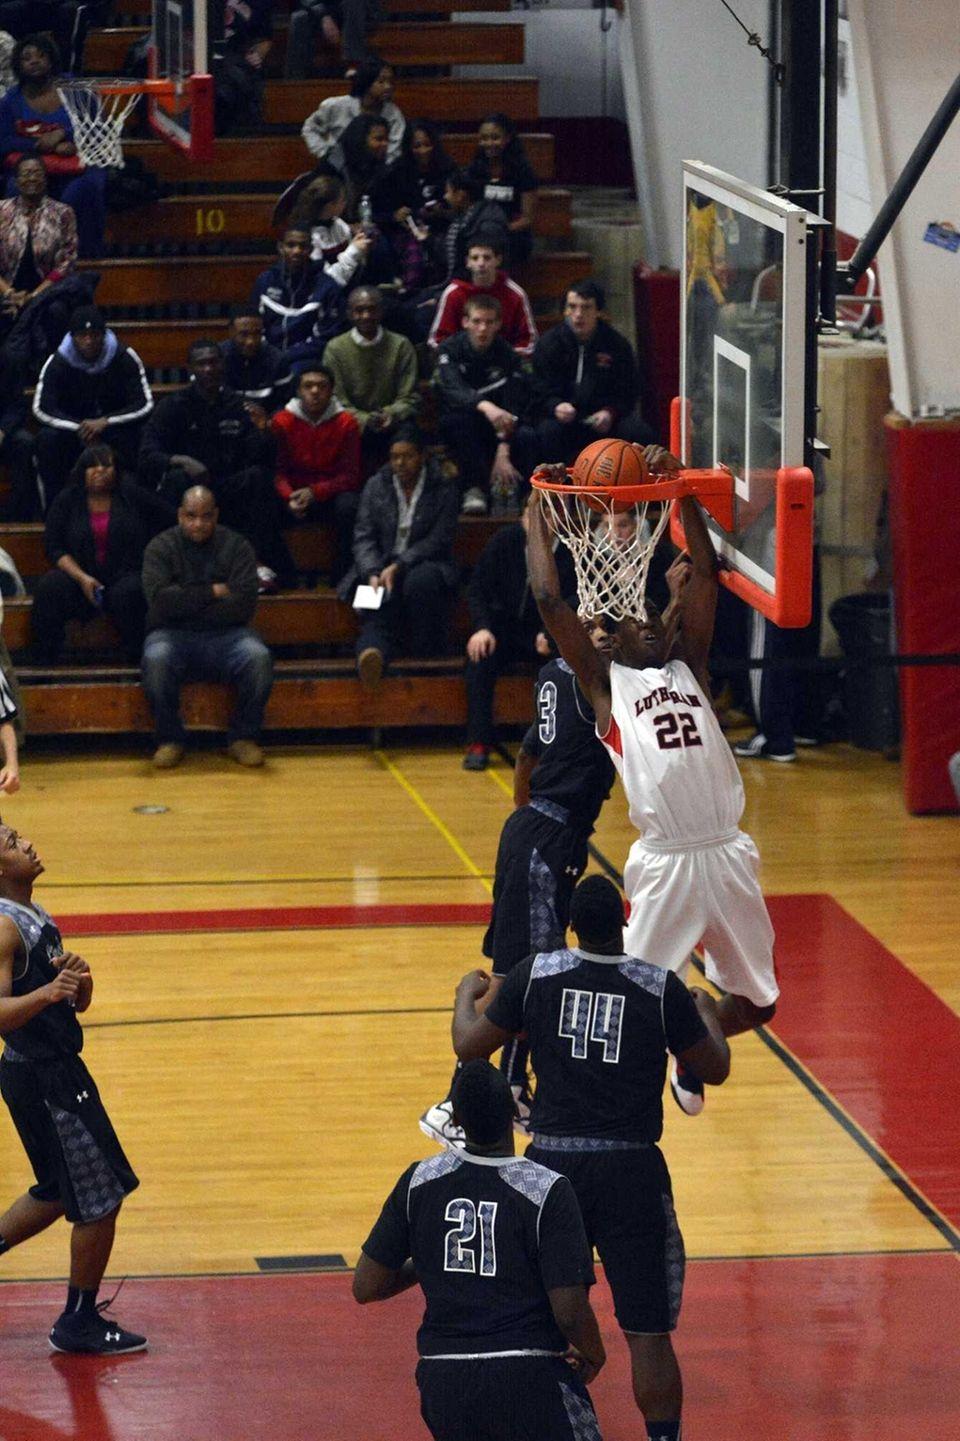 Lutheran forward/center Kentan Facey slam dunks the ball